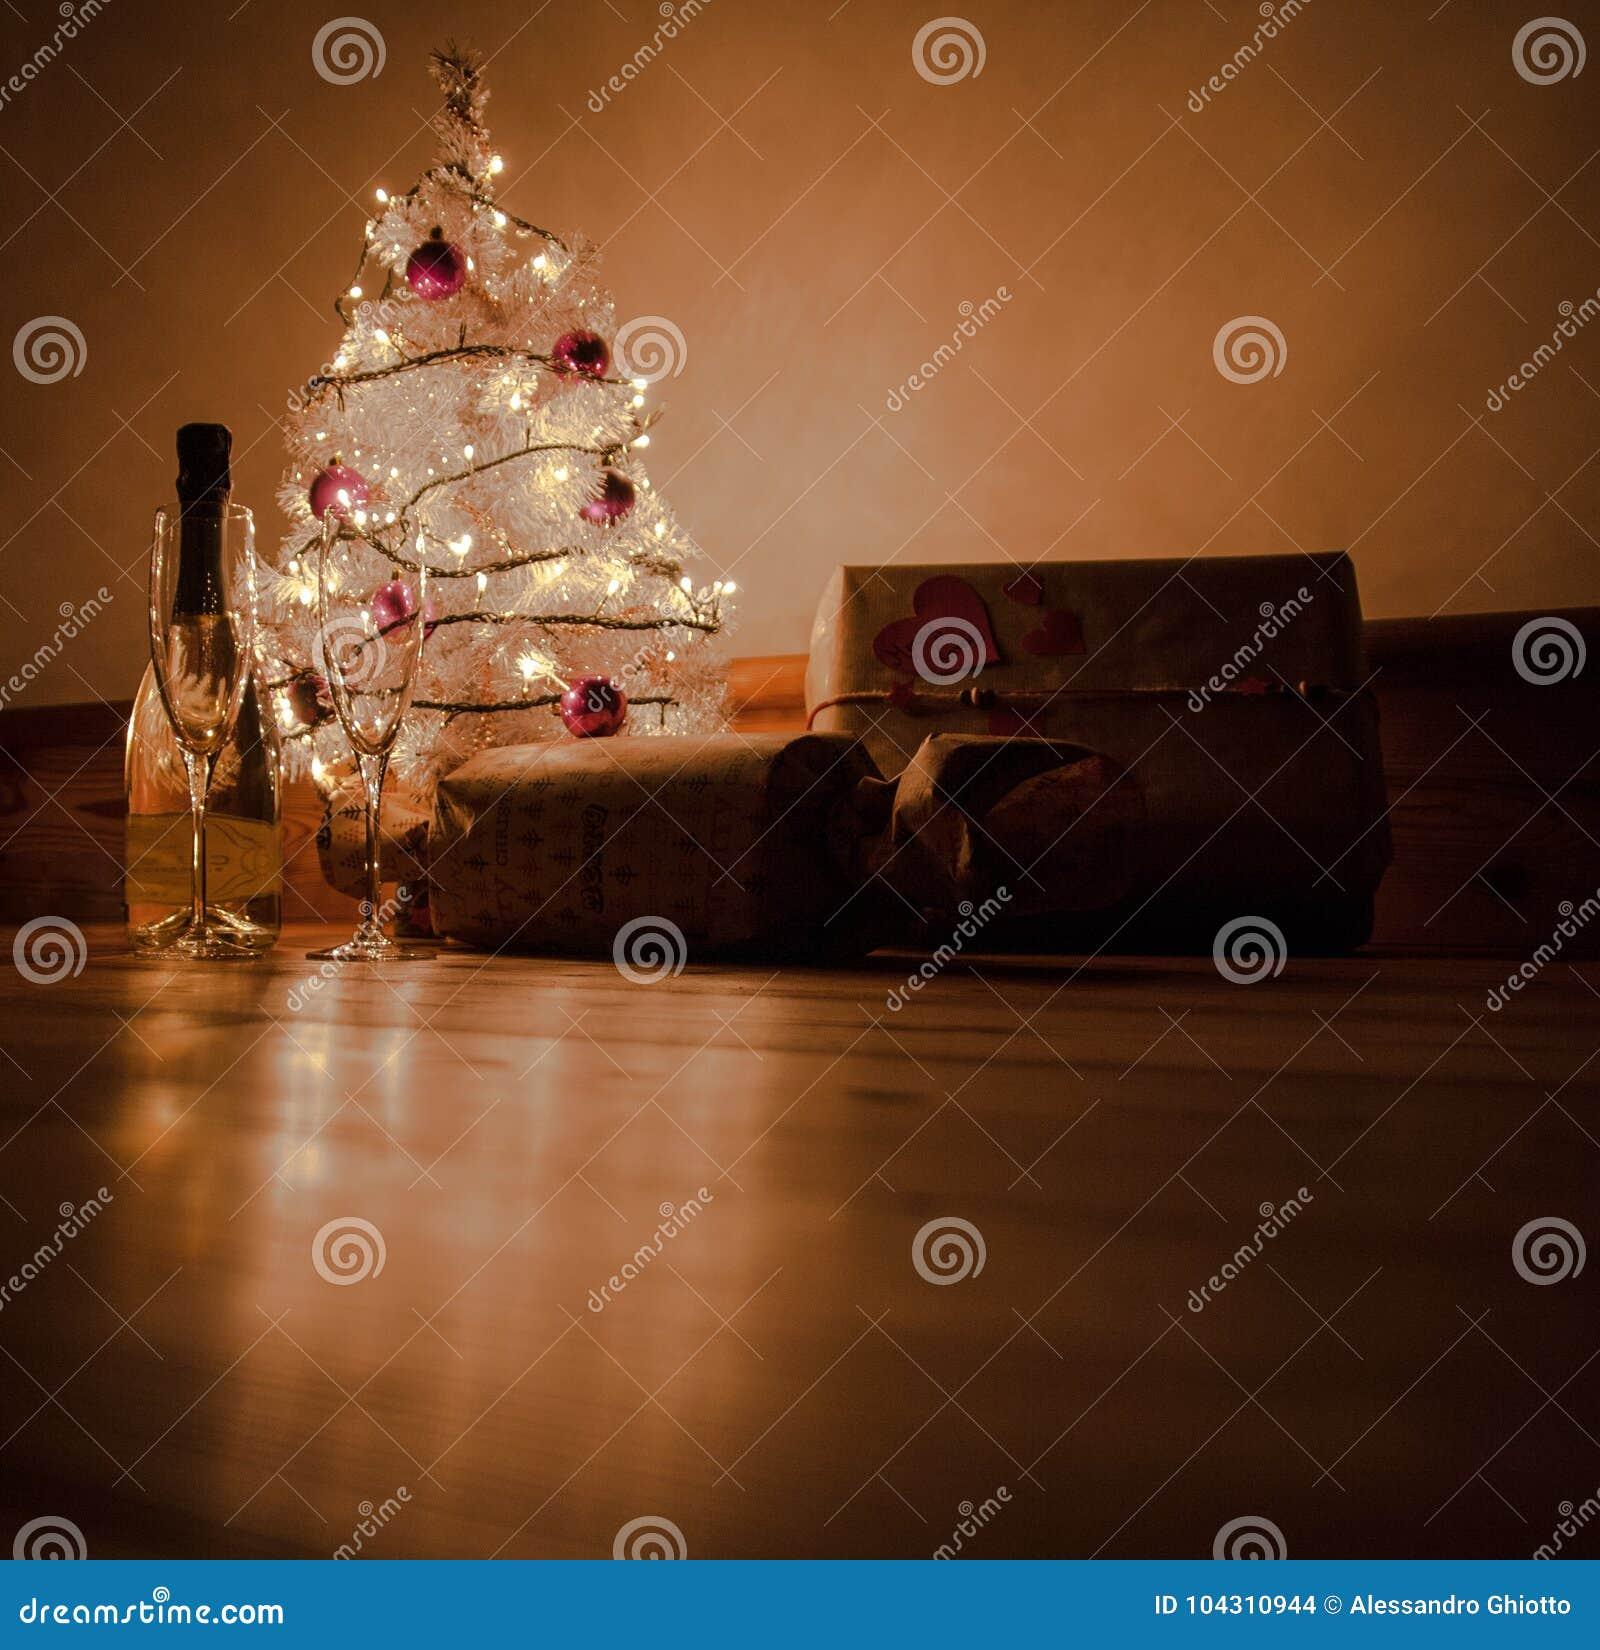 Jul rostar med gåvor under trädet